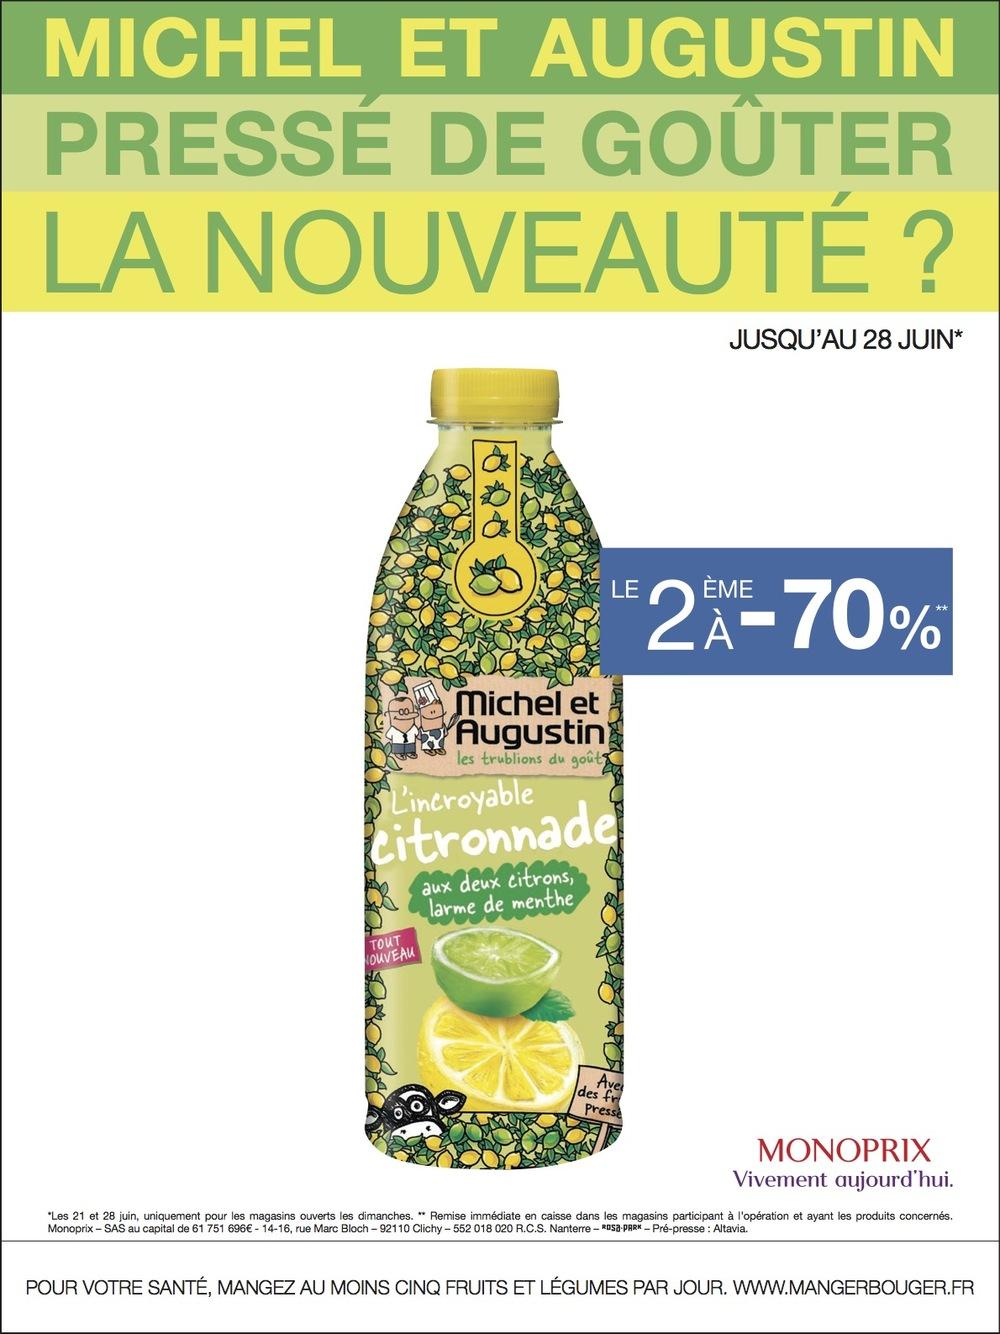 15203_210X280_AP-20min_Michel_Augustin.jpeg